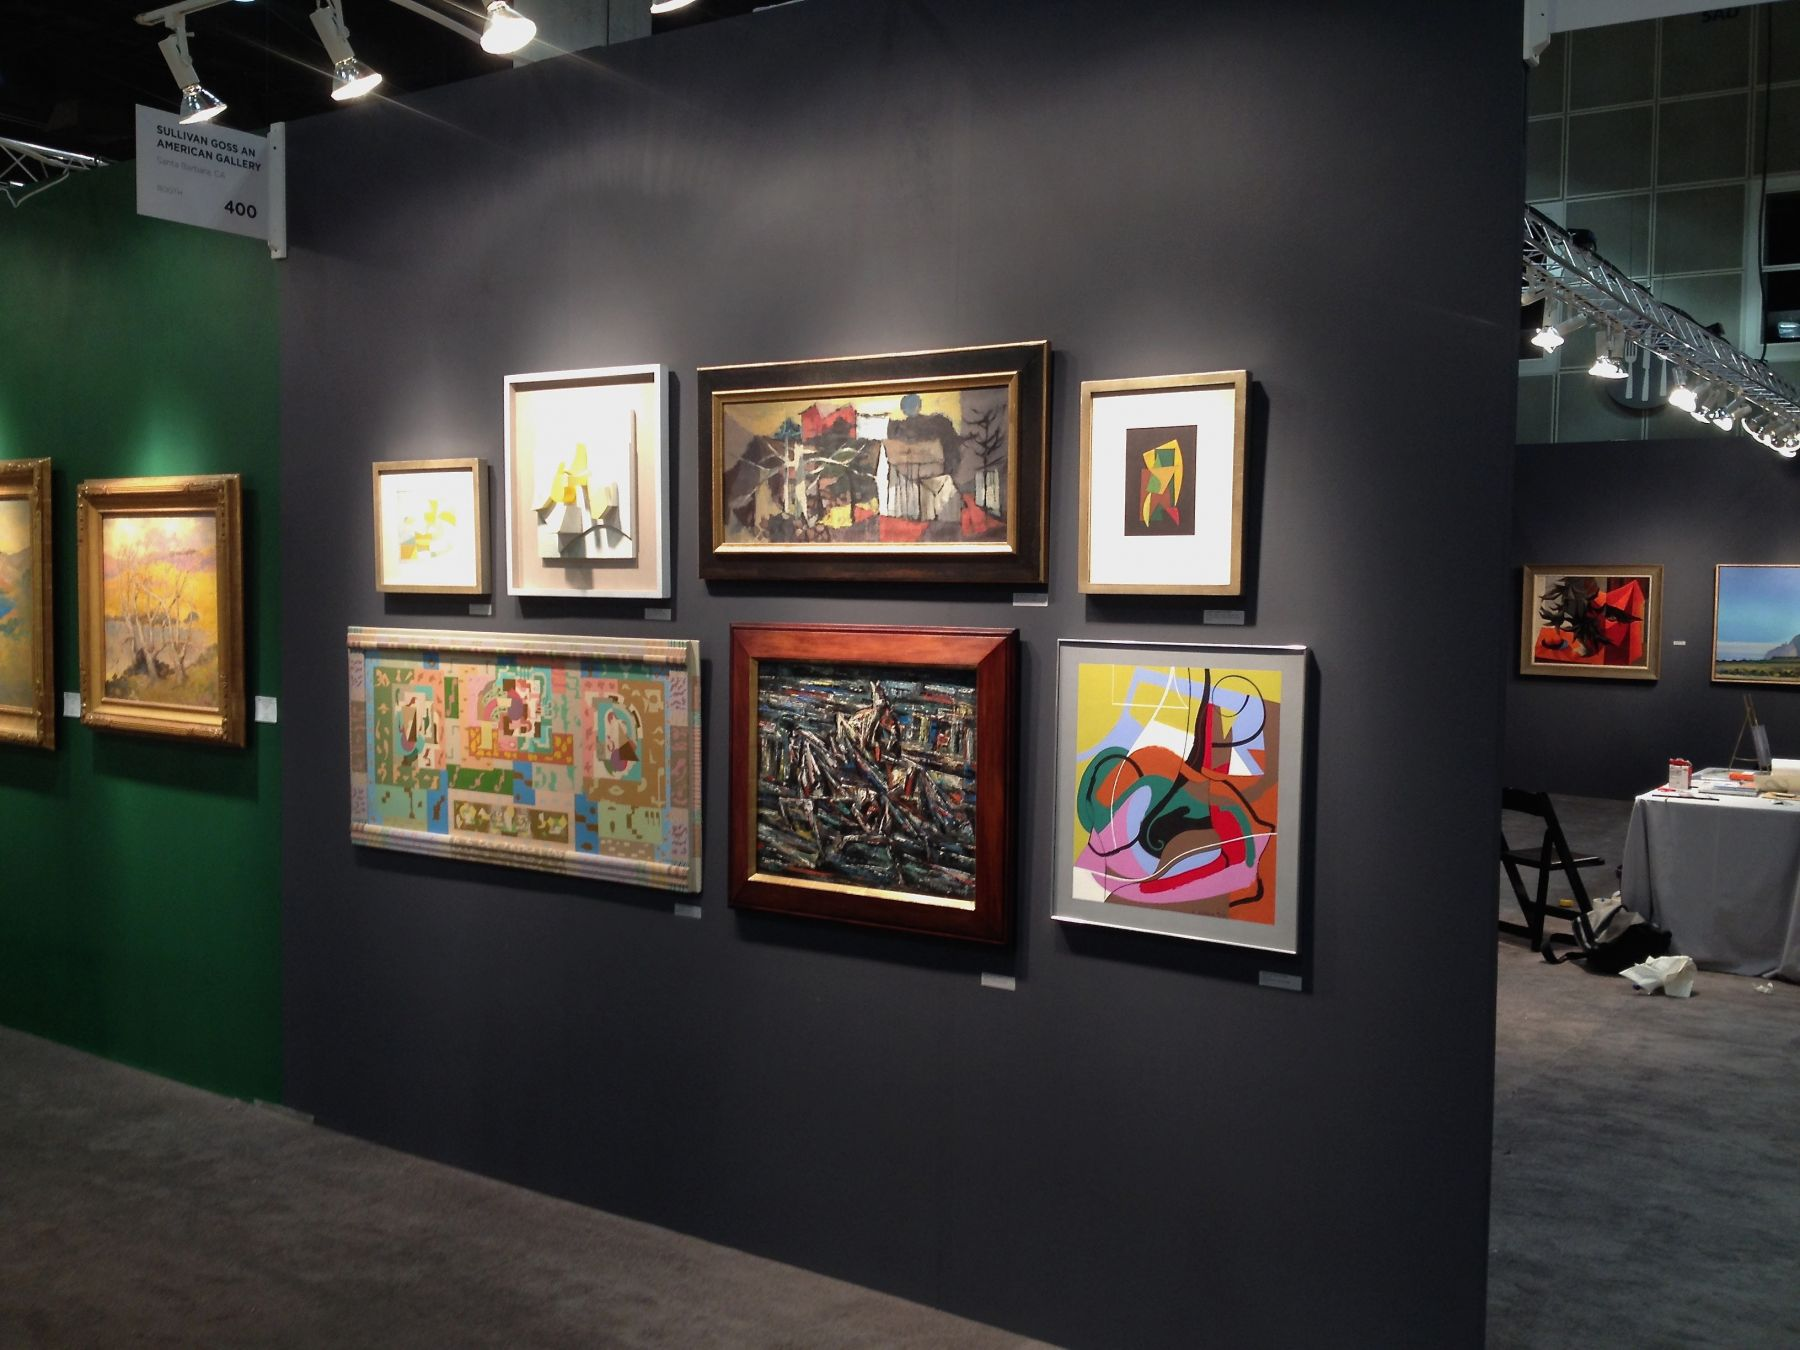 LA ART SHOW, 2014 installation